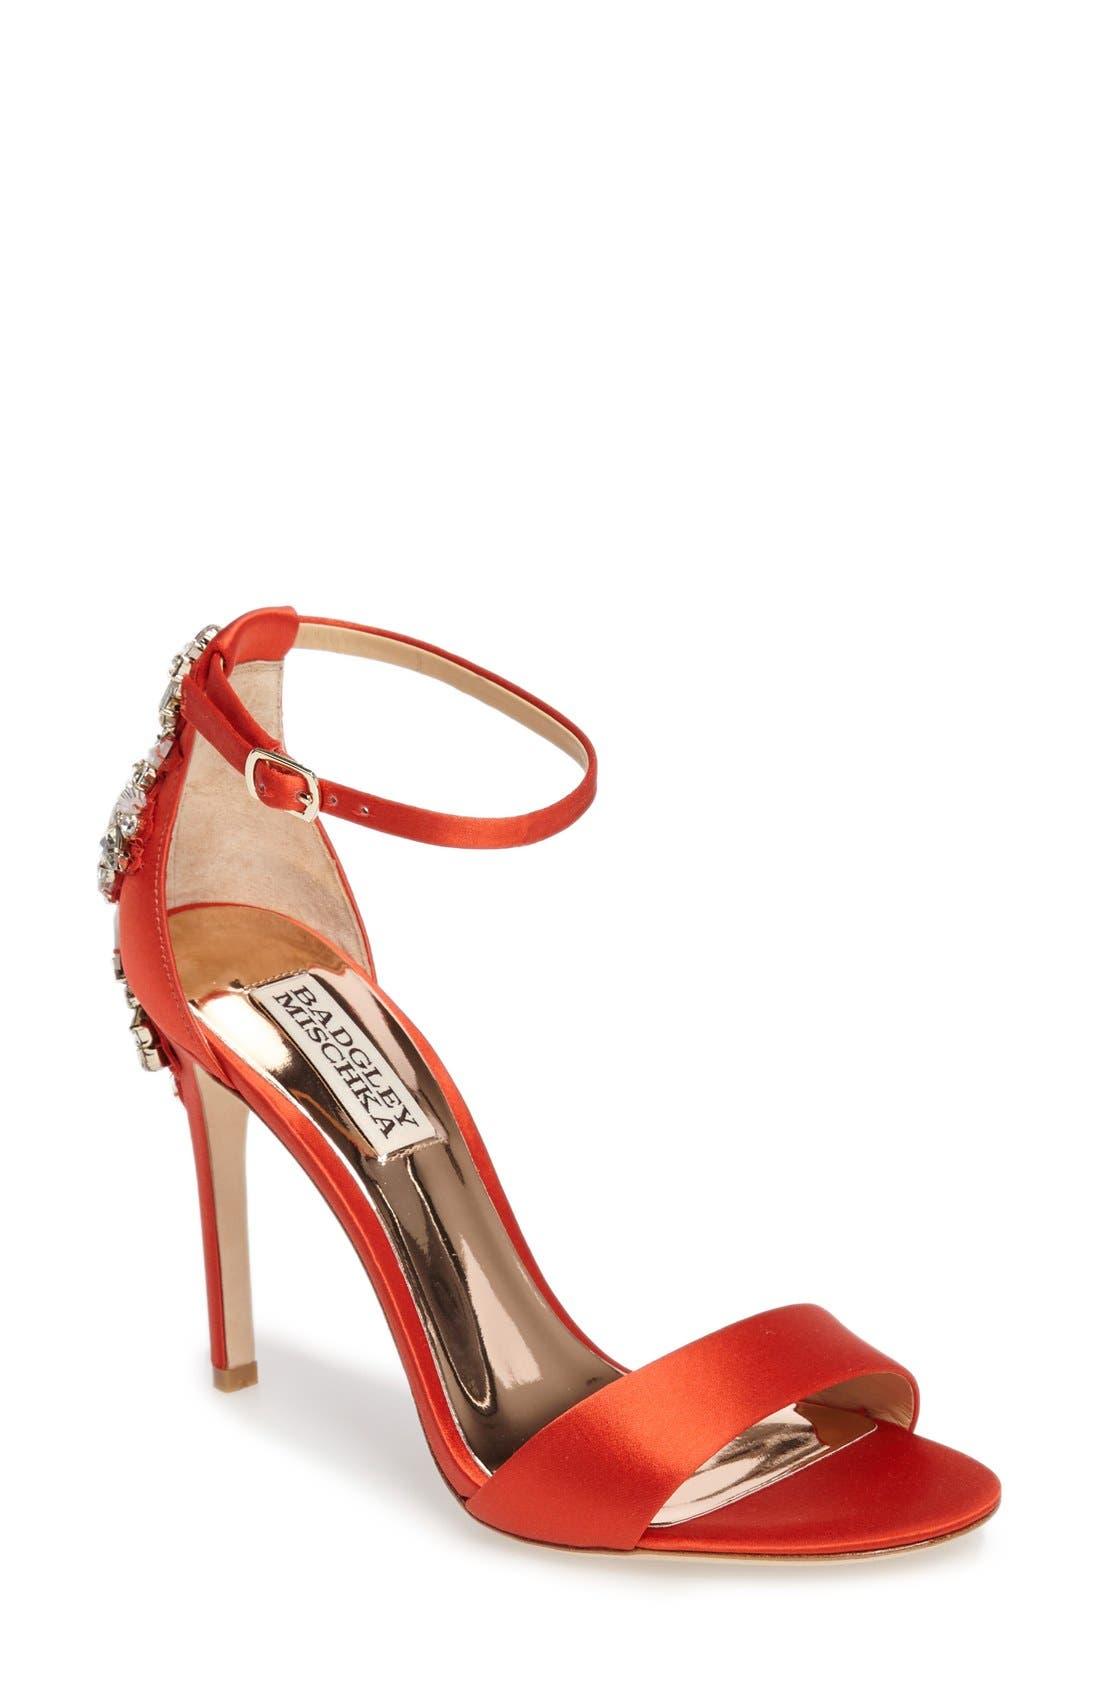 Main Image - Badgley Mischka Bartley Ankle Strap Sandal (Women)